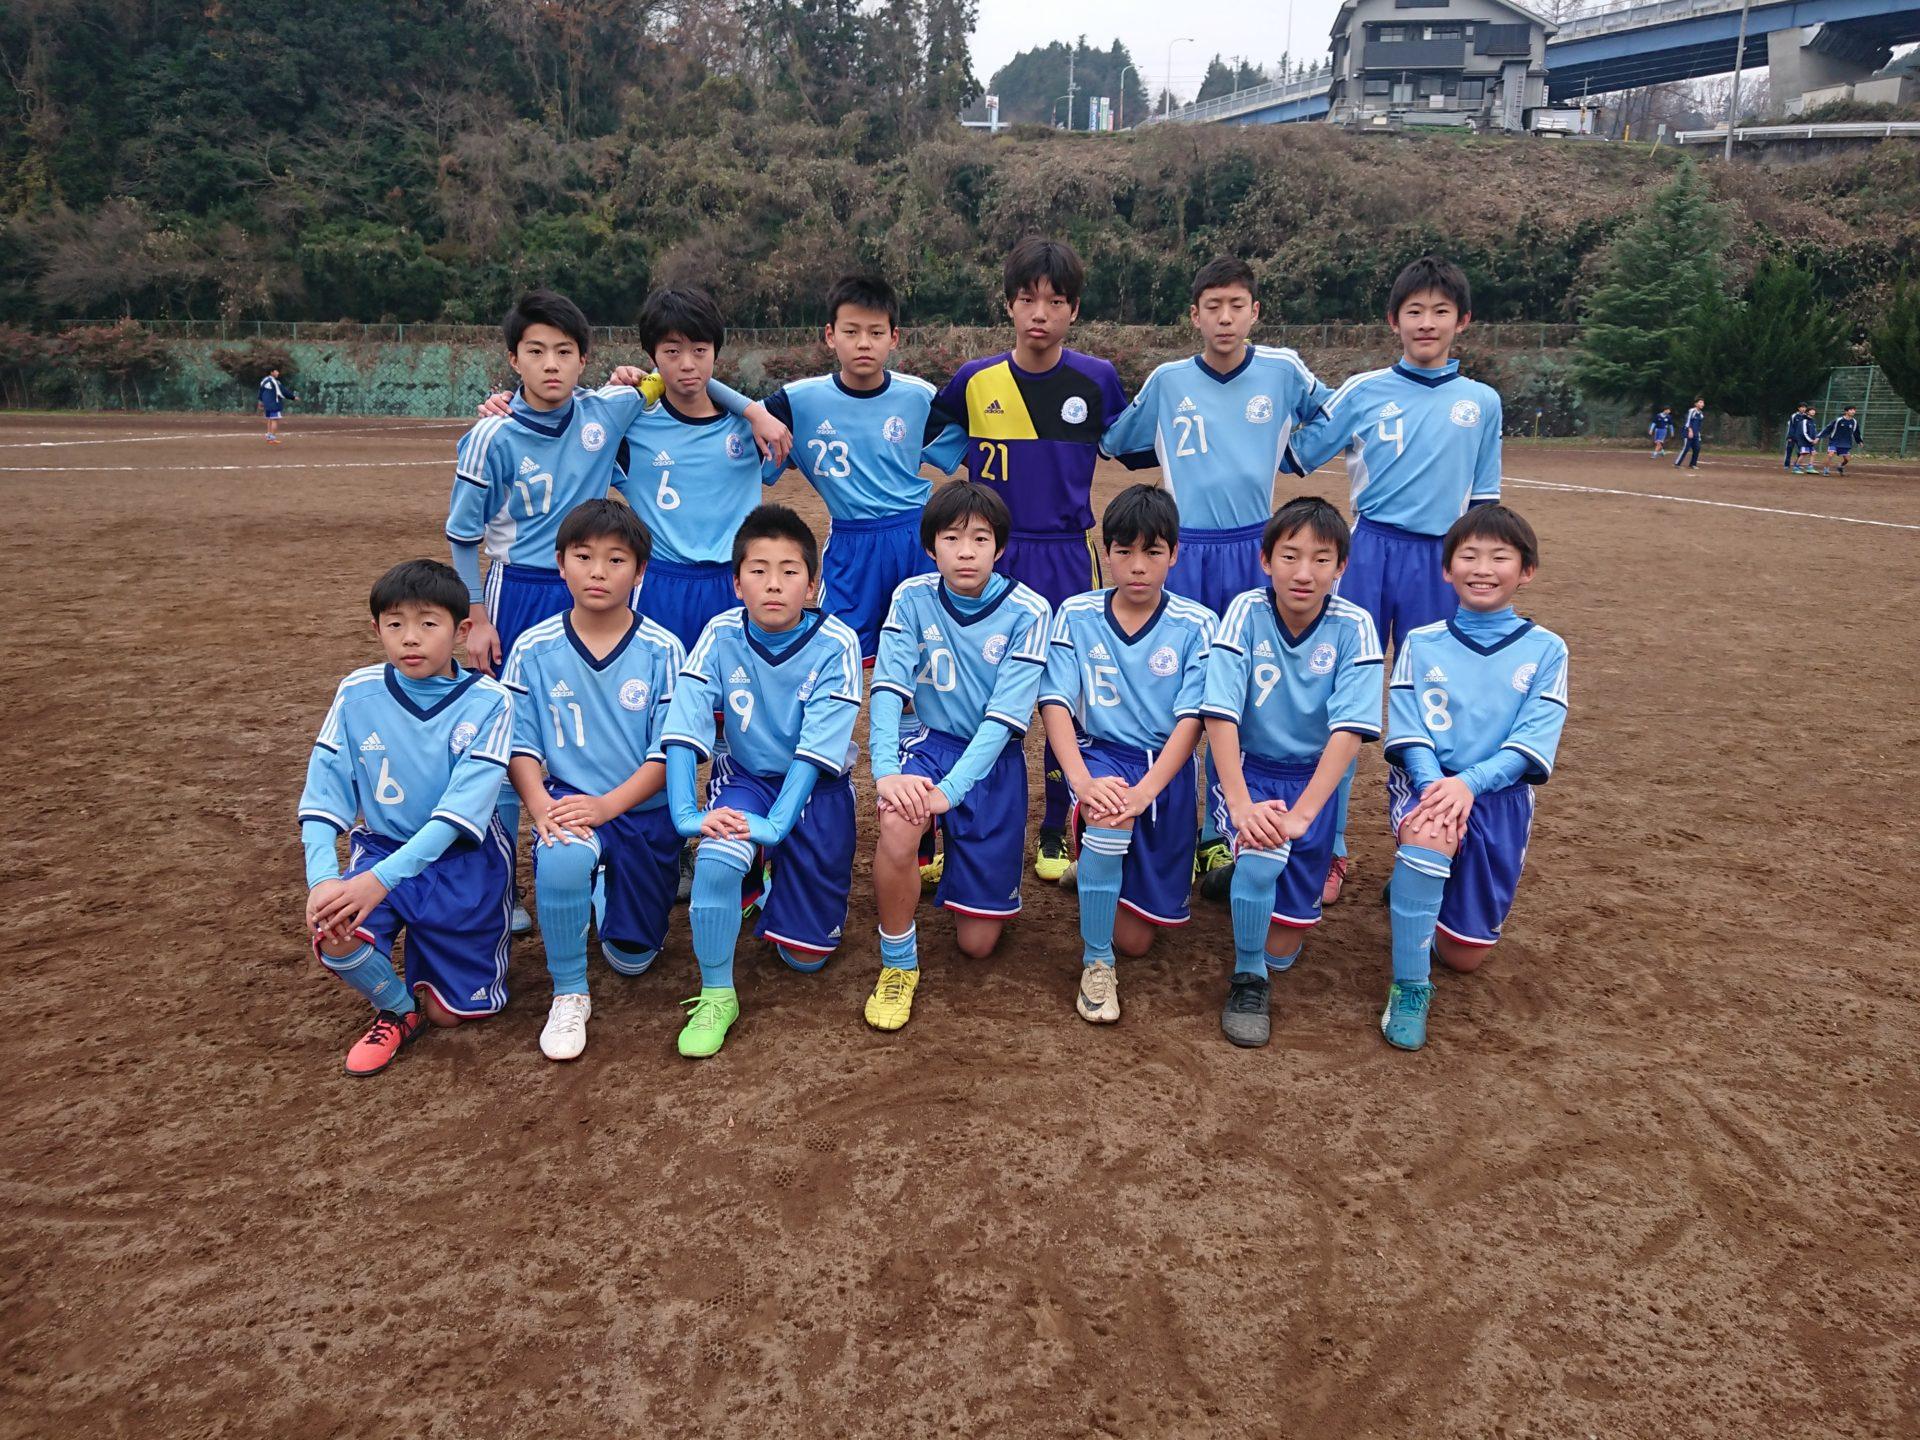 三多摩リーグU-13.14 vs Raffle瑞穂FC